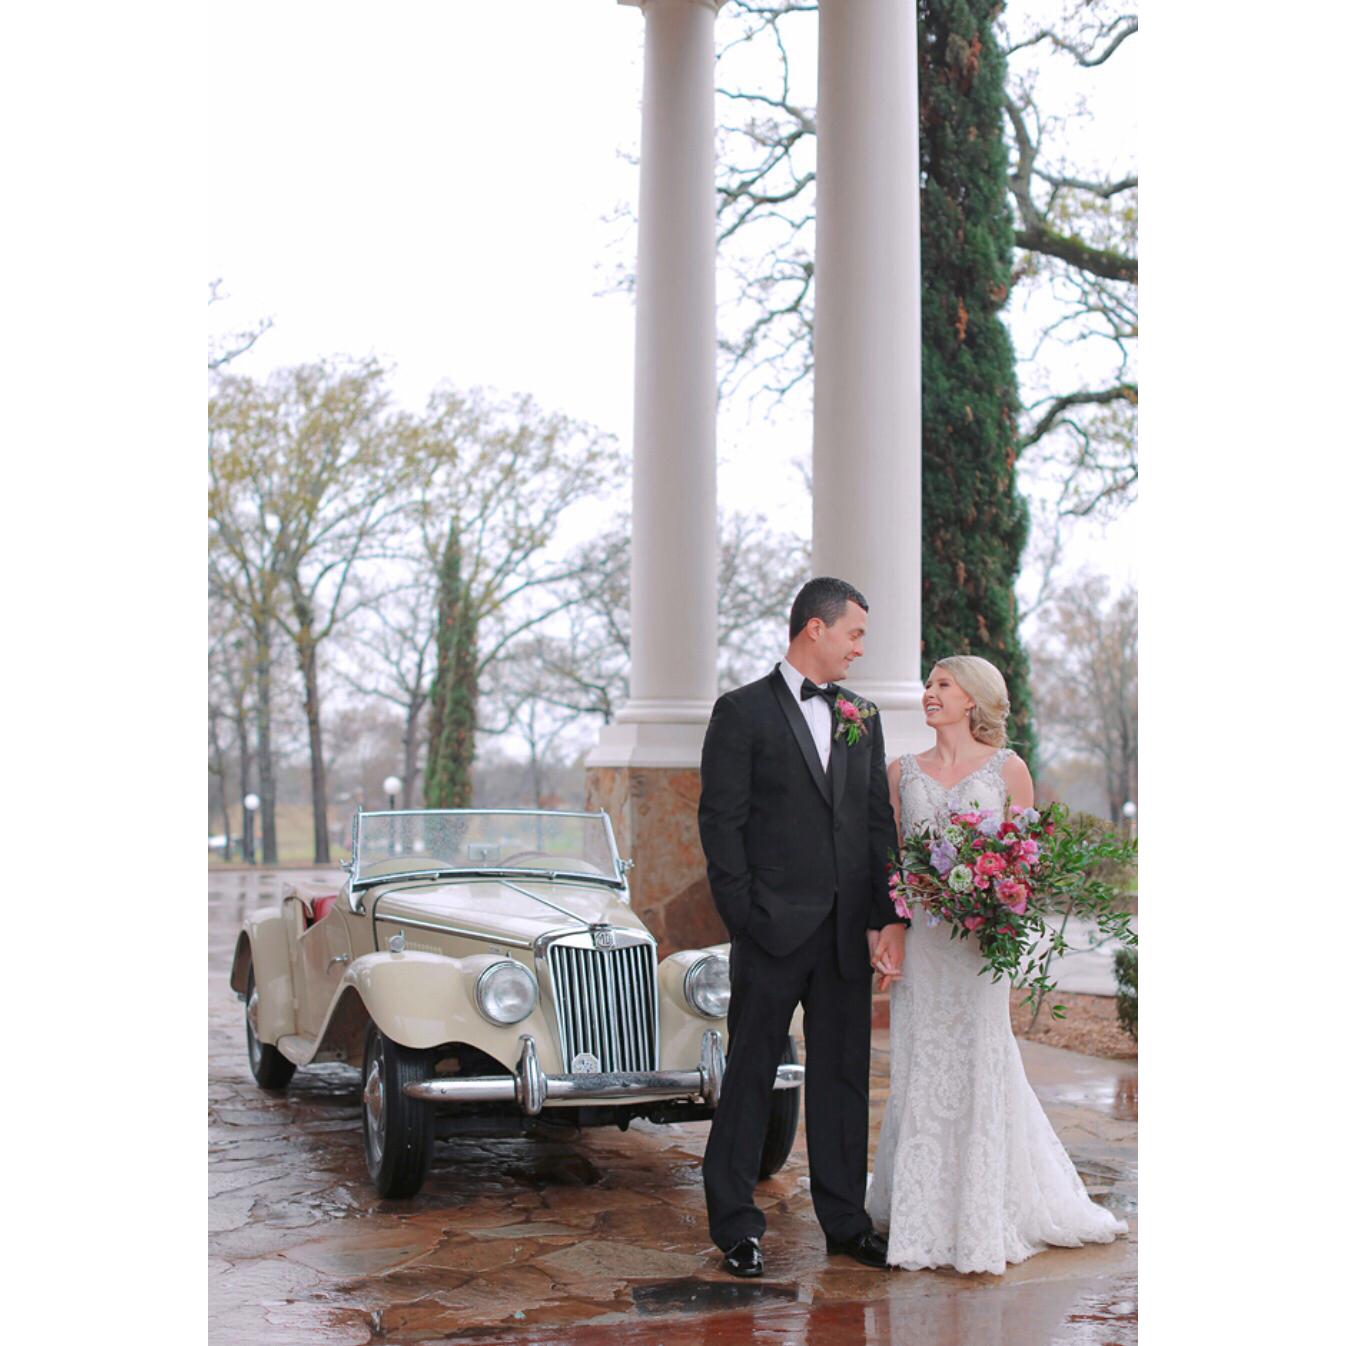 Villa di Felicita • wedding venue in Tyler Texas east of